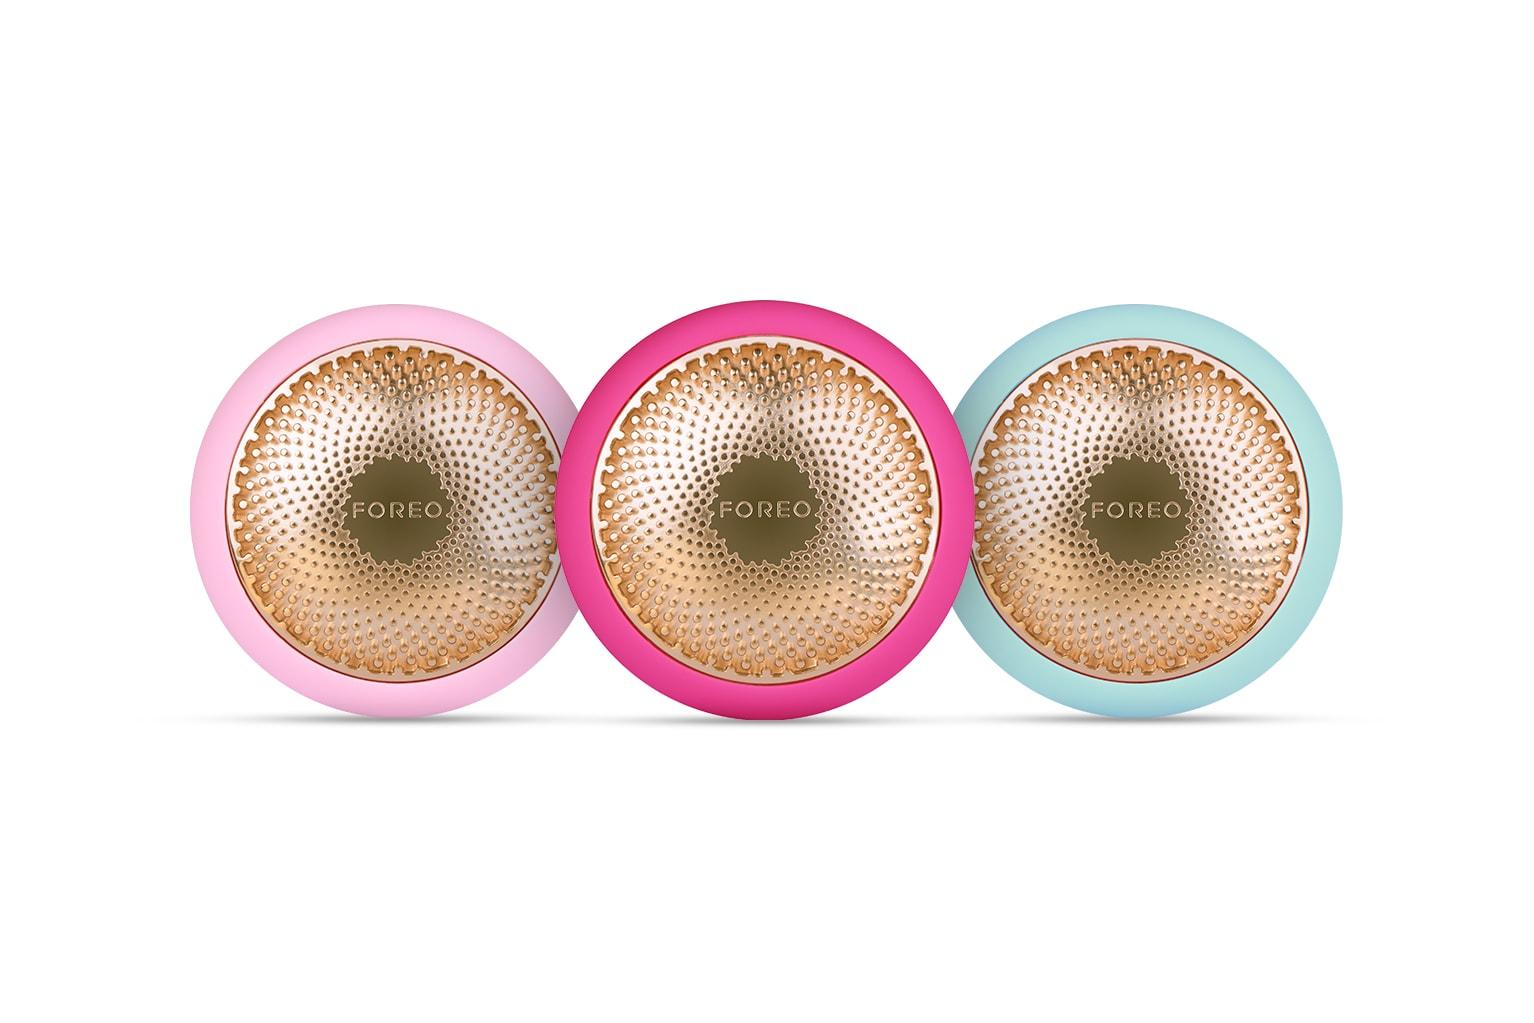 FOREO UFO 2 Skincare Device Sheet Masks Beauty Product